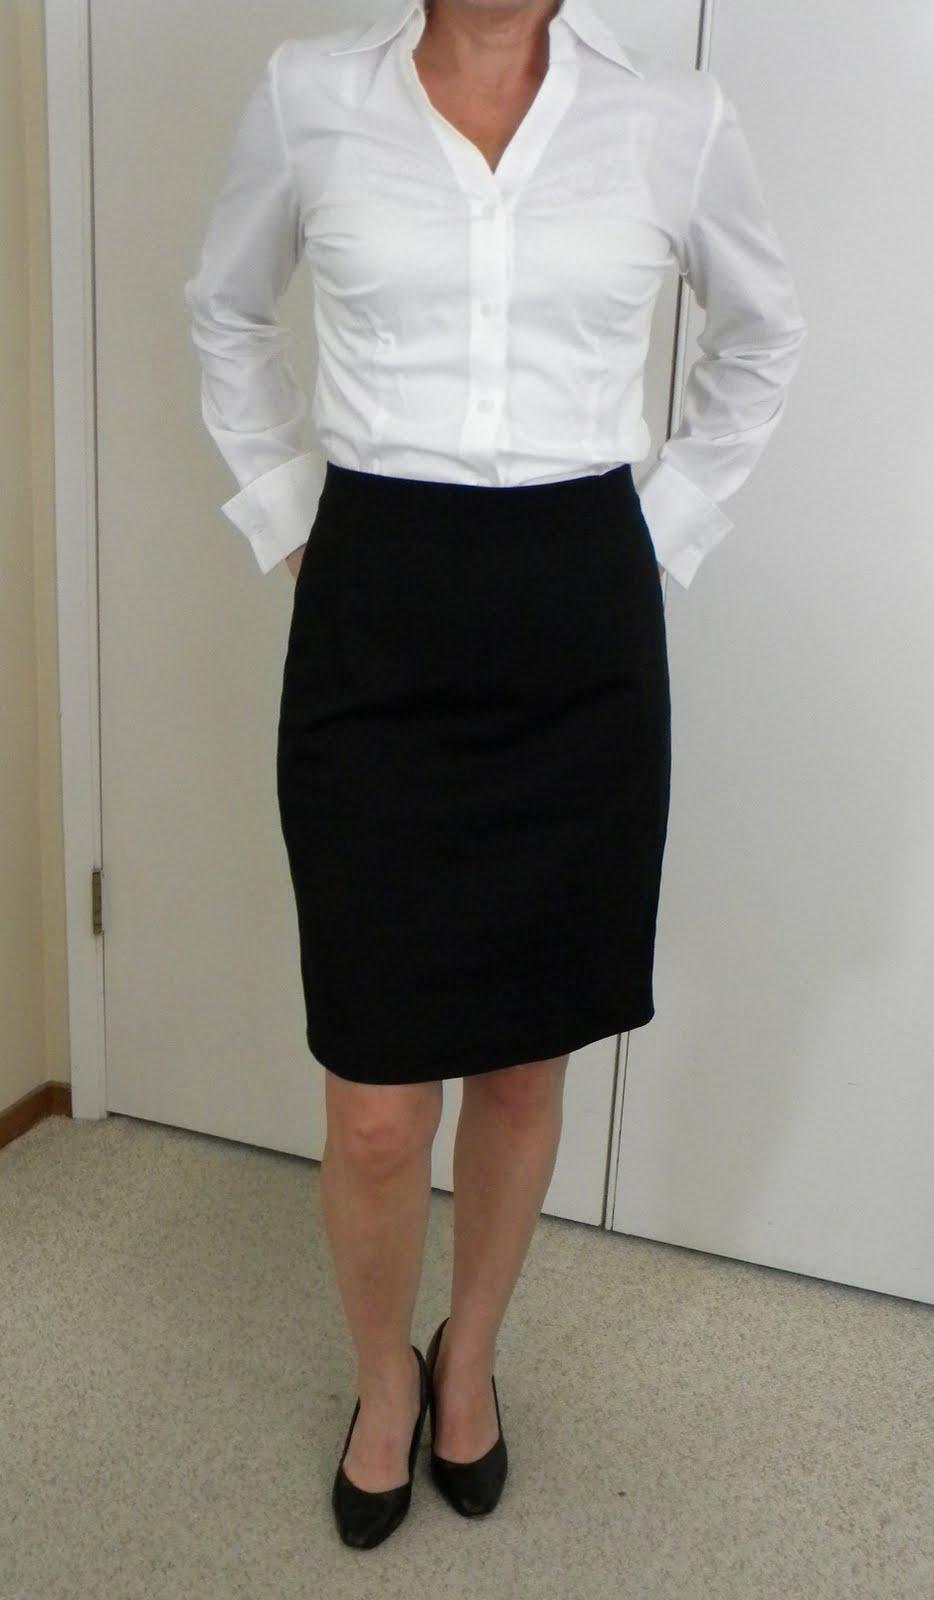 Black Pencil Skirt And White Shirt | Jill Dress